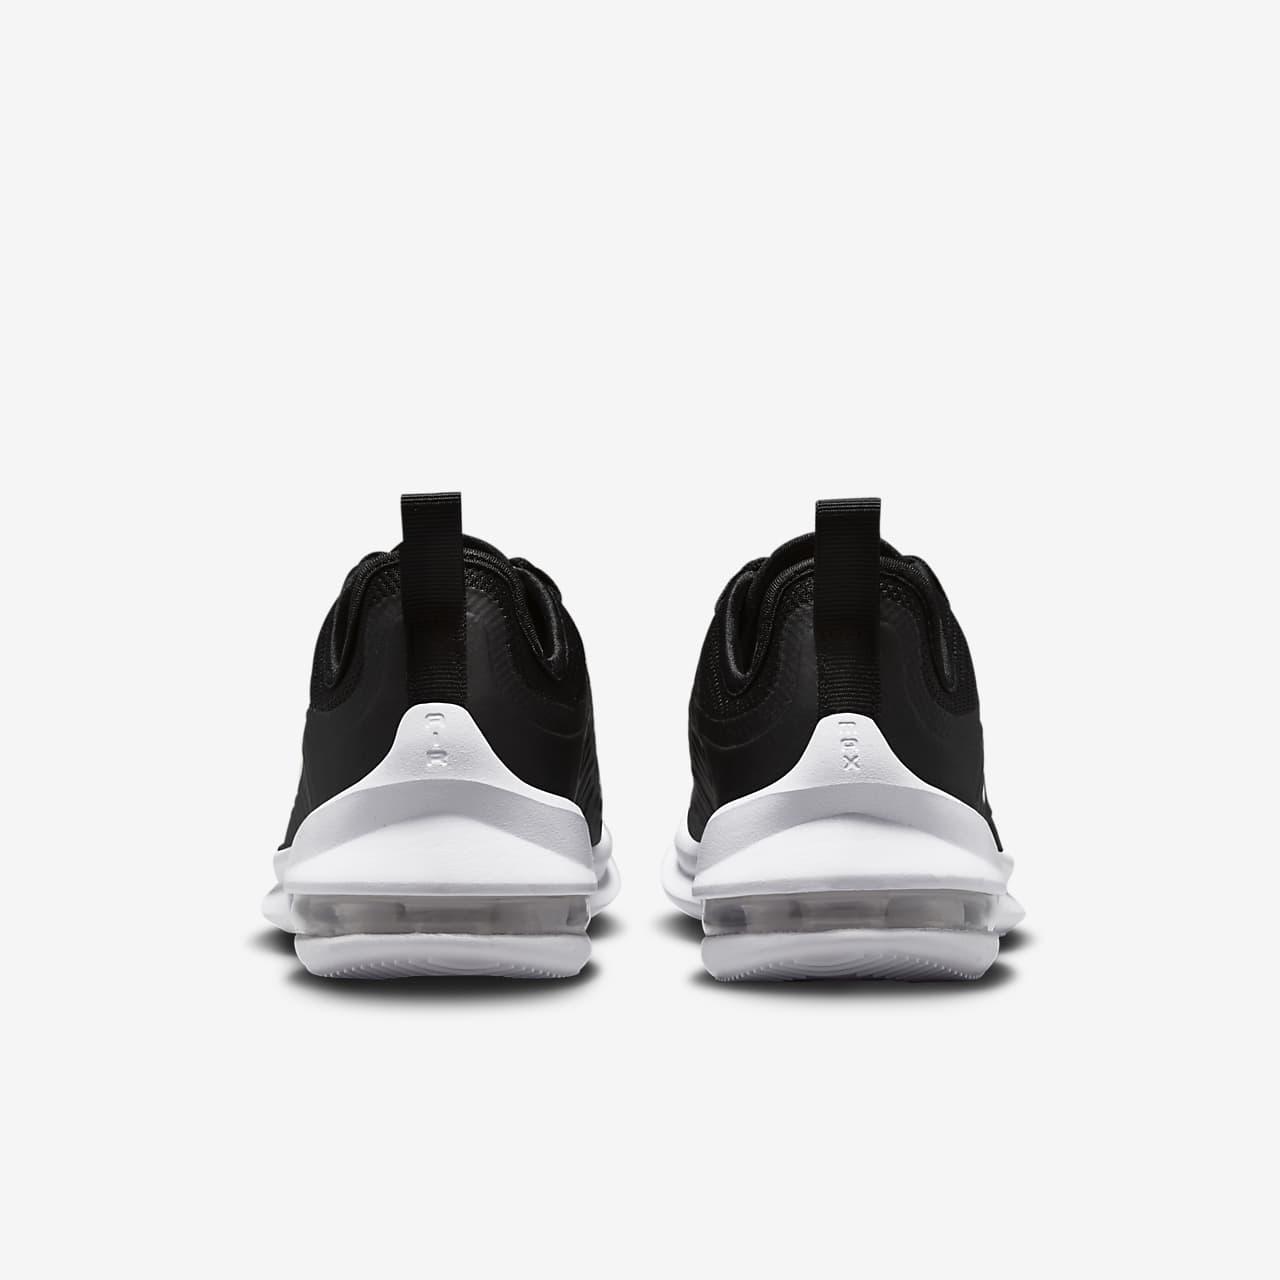 premium selection ca95b 26bea ... Scarpa Nike Air Max Axis - Ragazzi